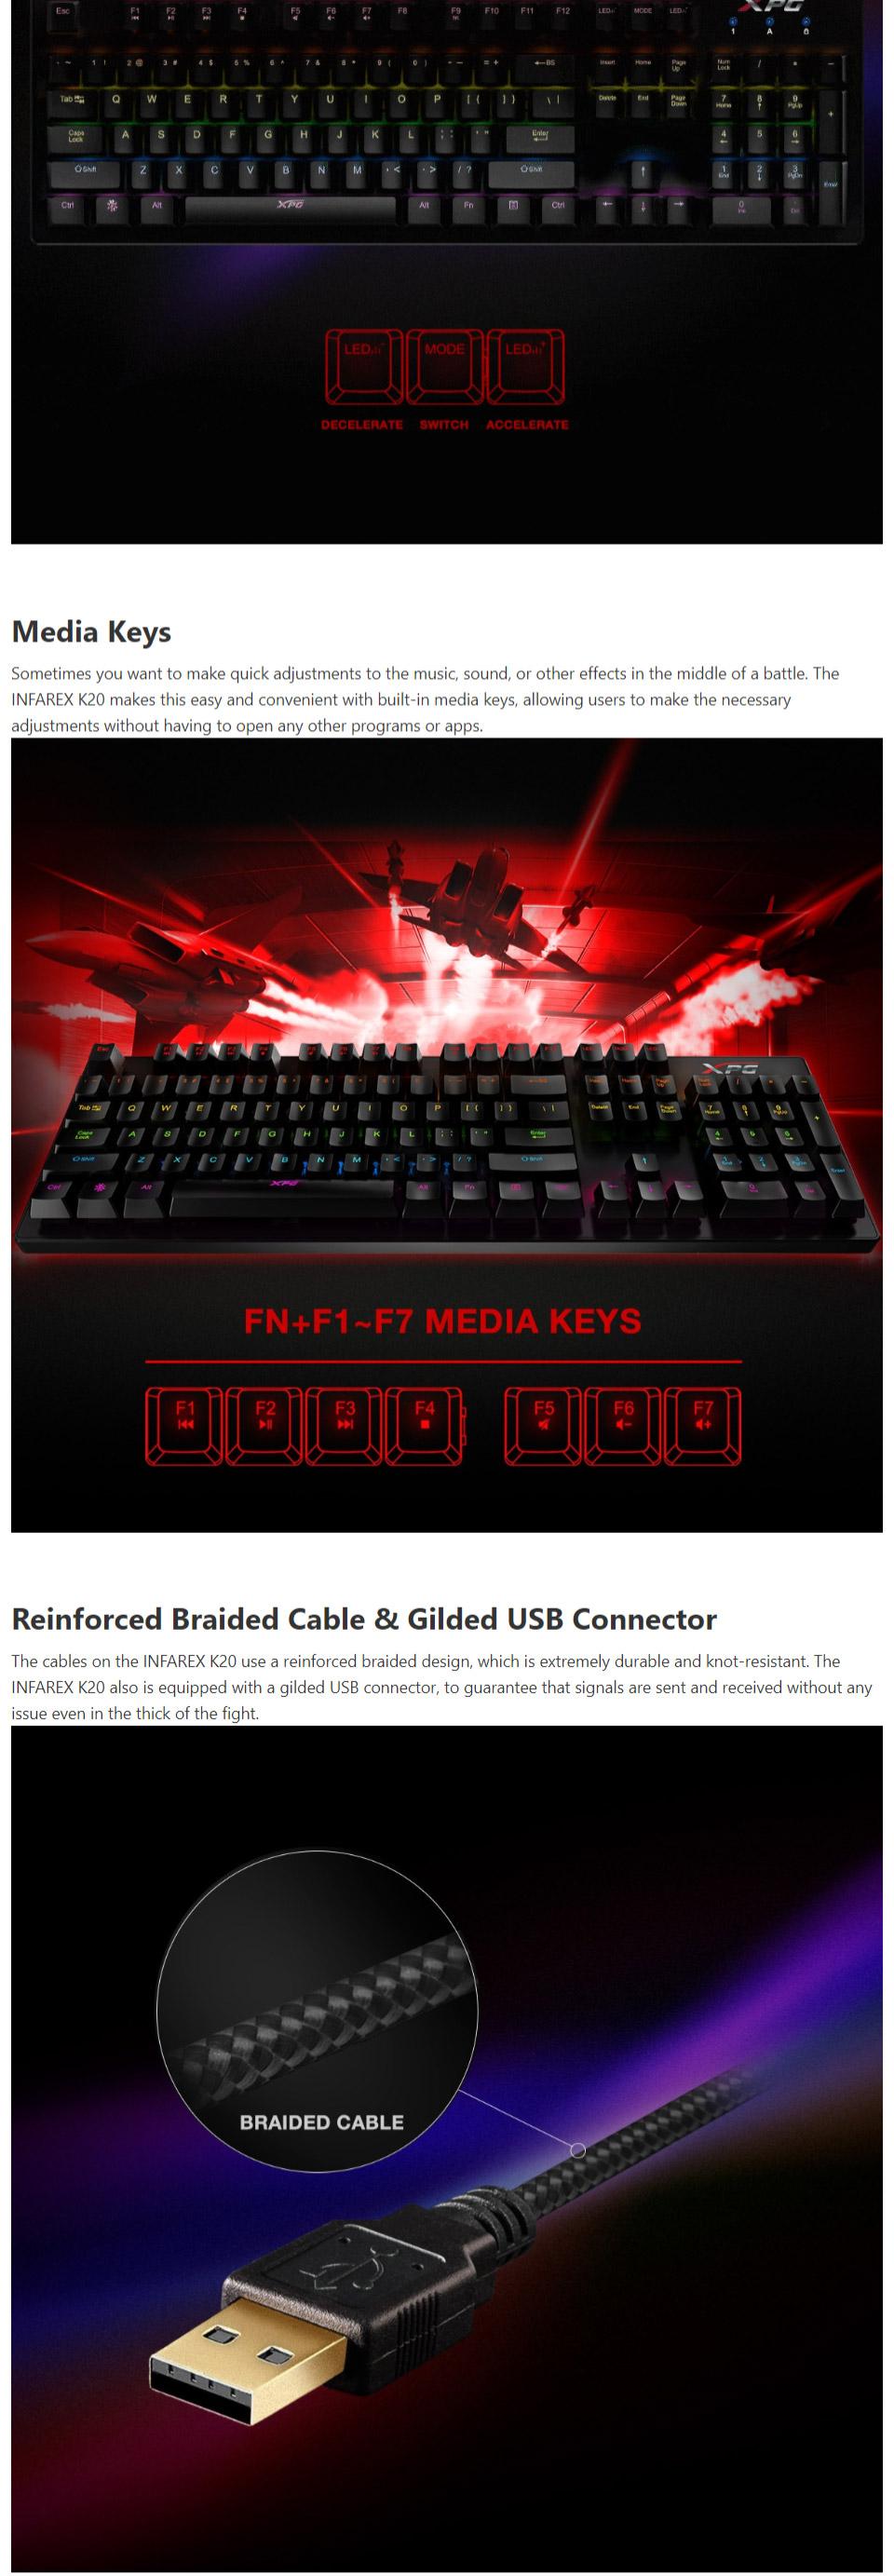 Buy Adata Xpg Rgb K20 Mechanical Gaming Keyboard Infarex Blue Kb Ad K20 Pc Case Gear Australia